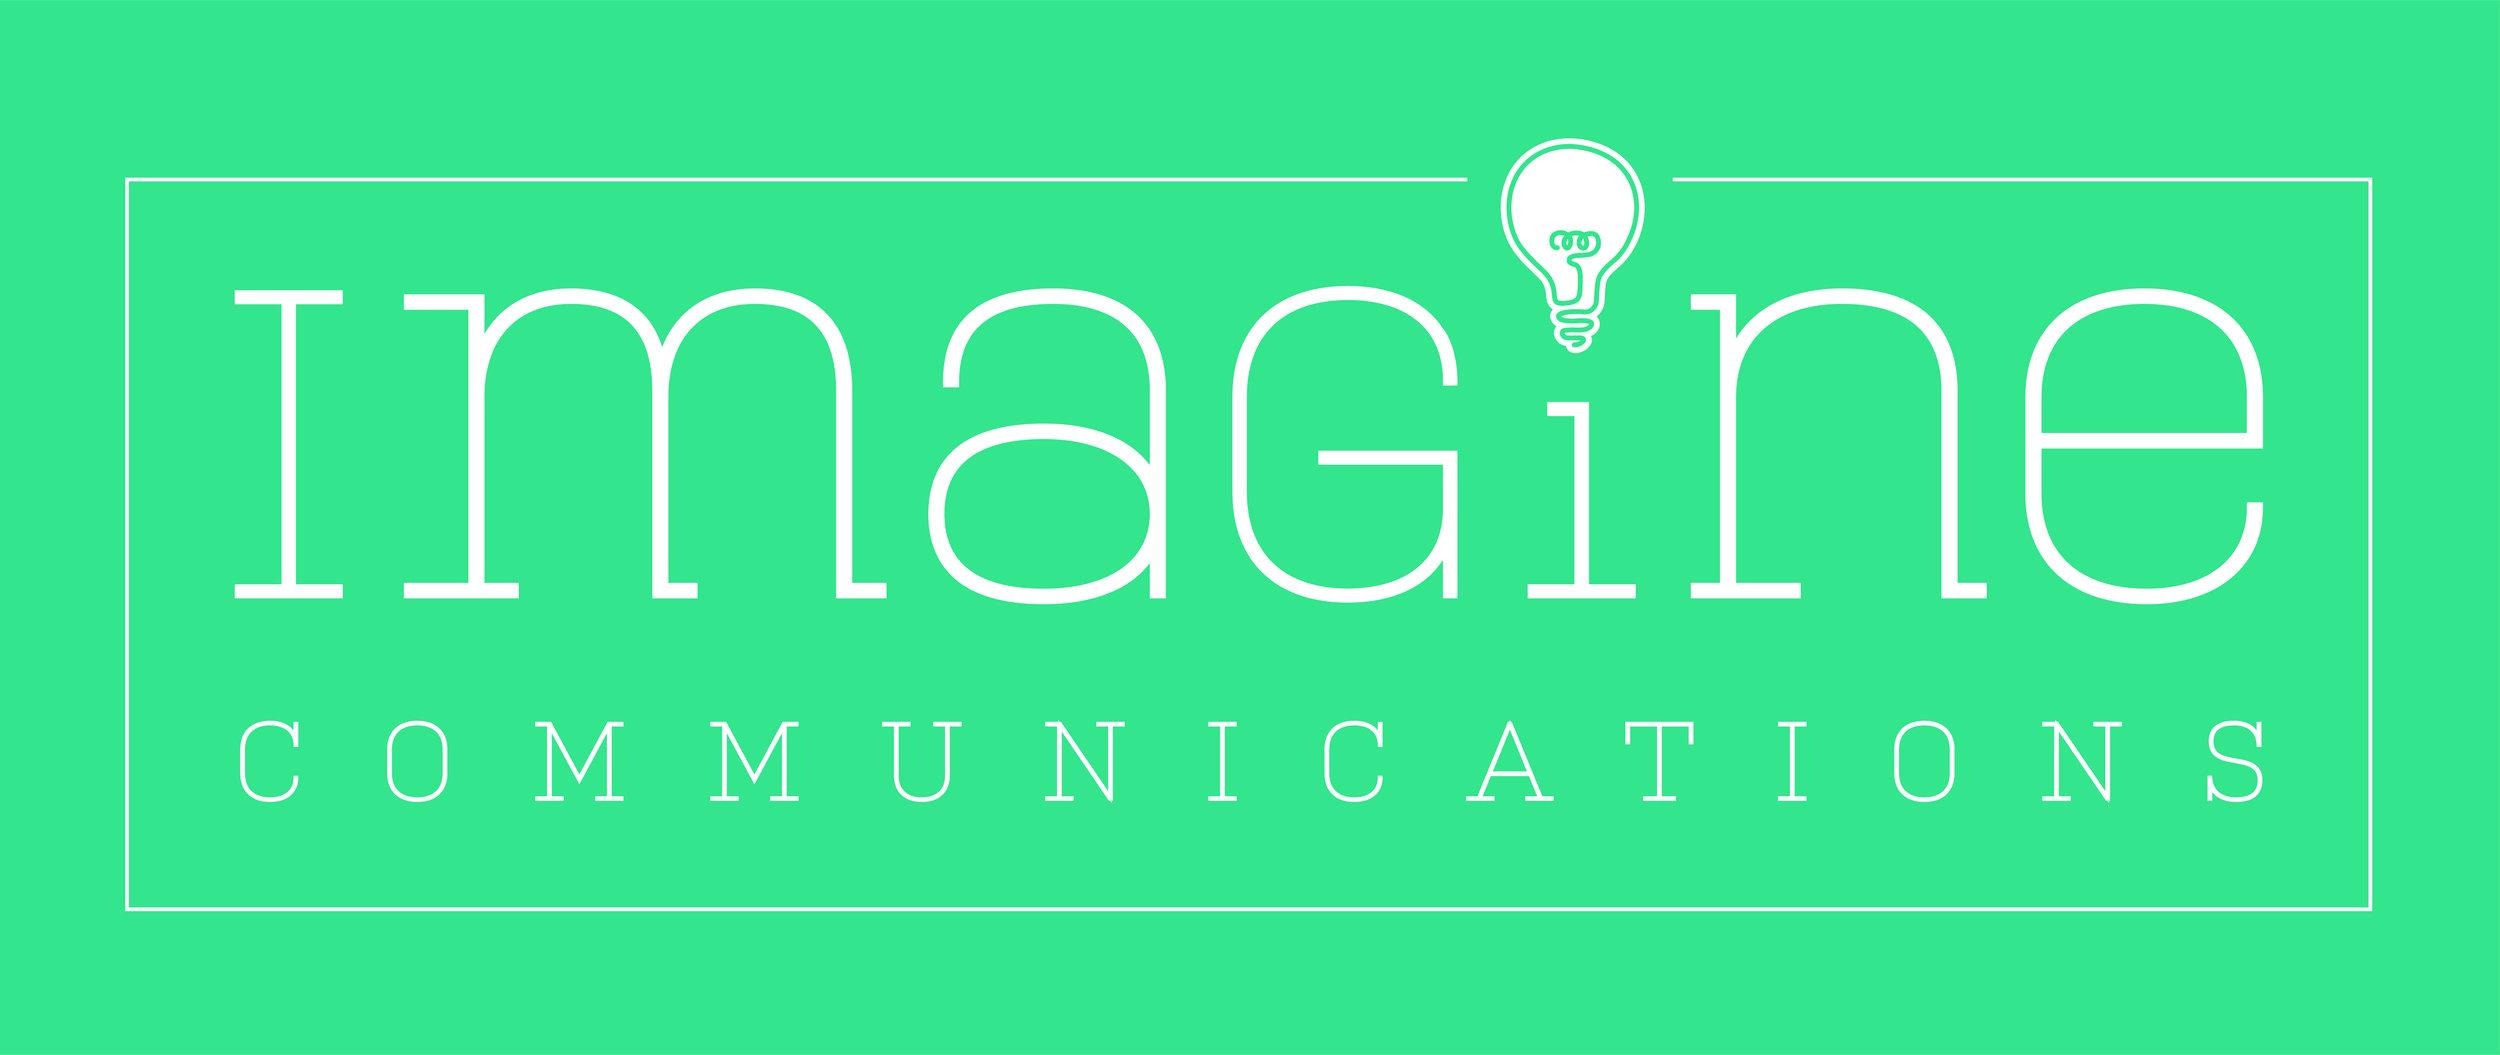 IC_Logo_TealBG_HIRES.jpg